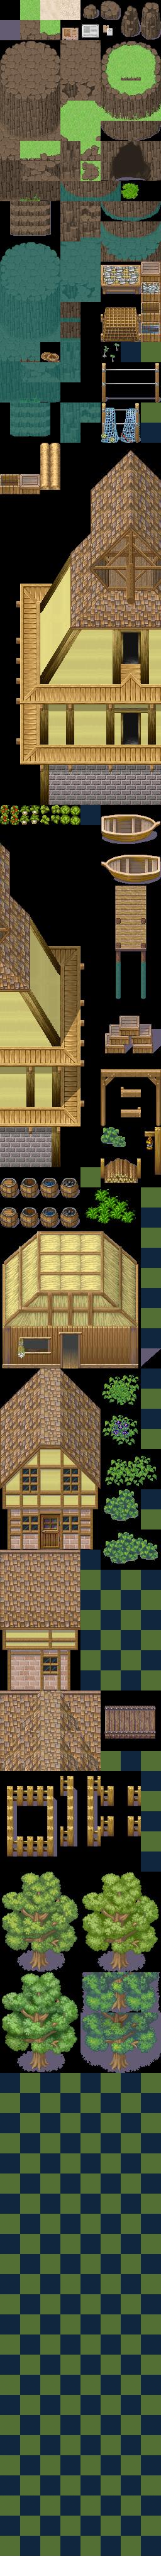 [RPG Maker XP] Tilesets by HyperSnake22 Lost_Island_by_HyperSnake22